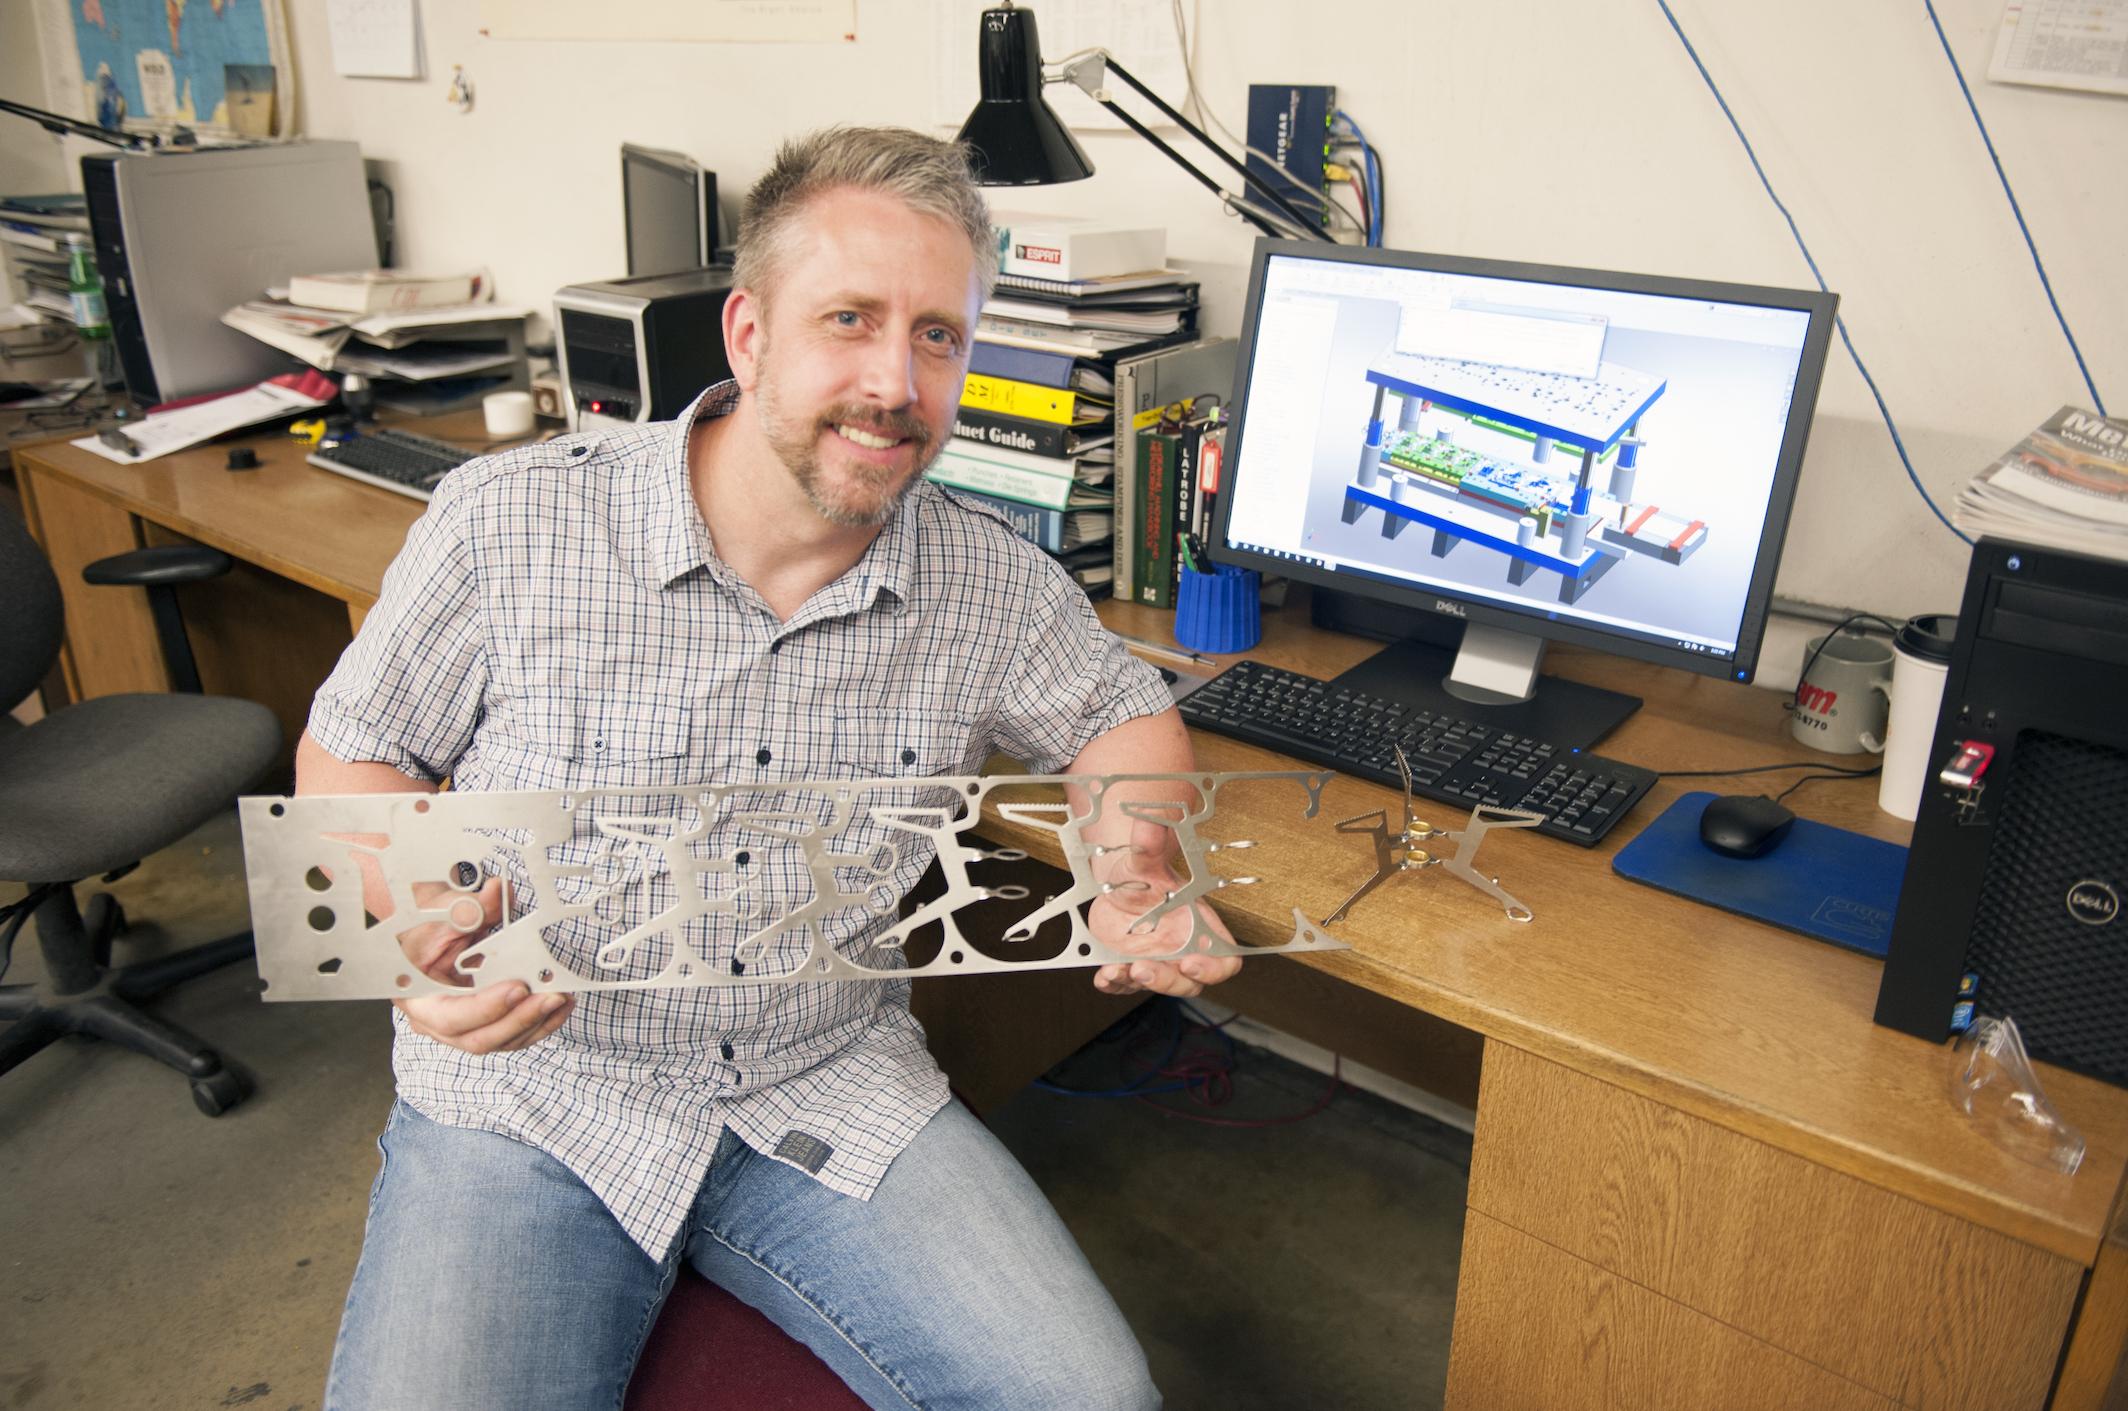 Tool shop's supervisor, Tim Sandin